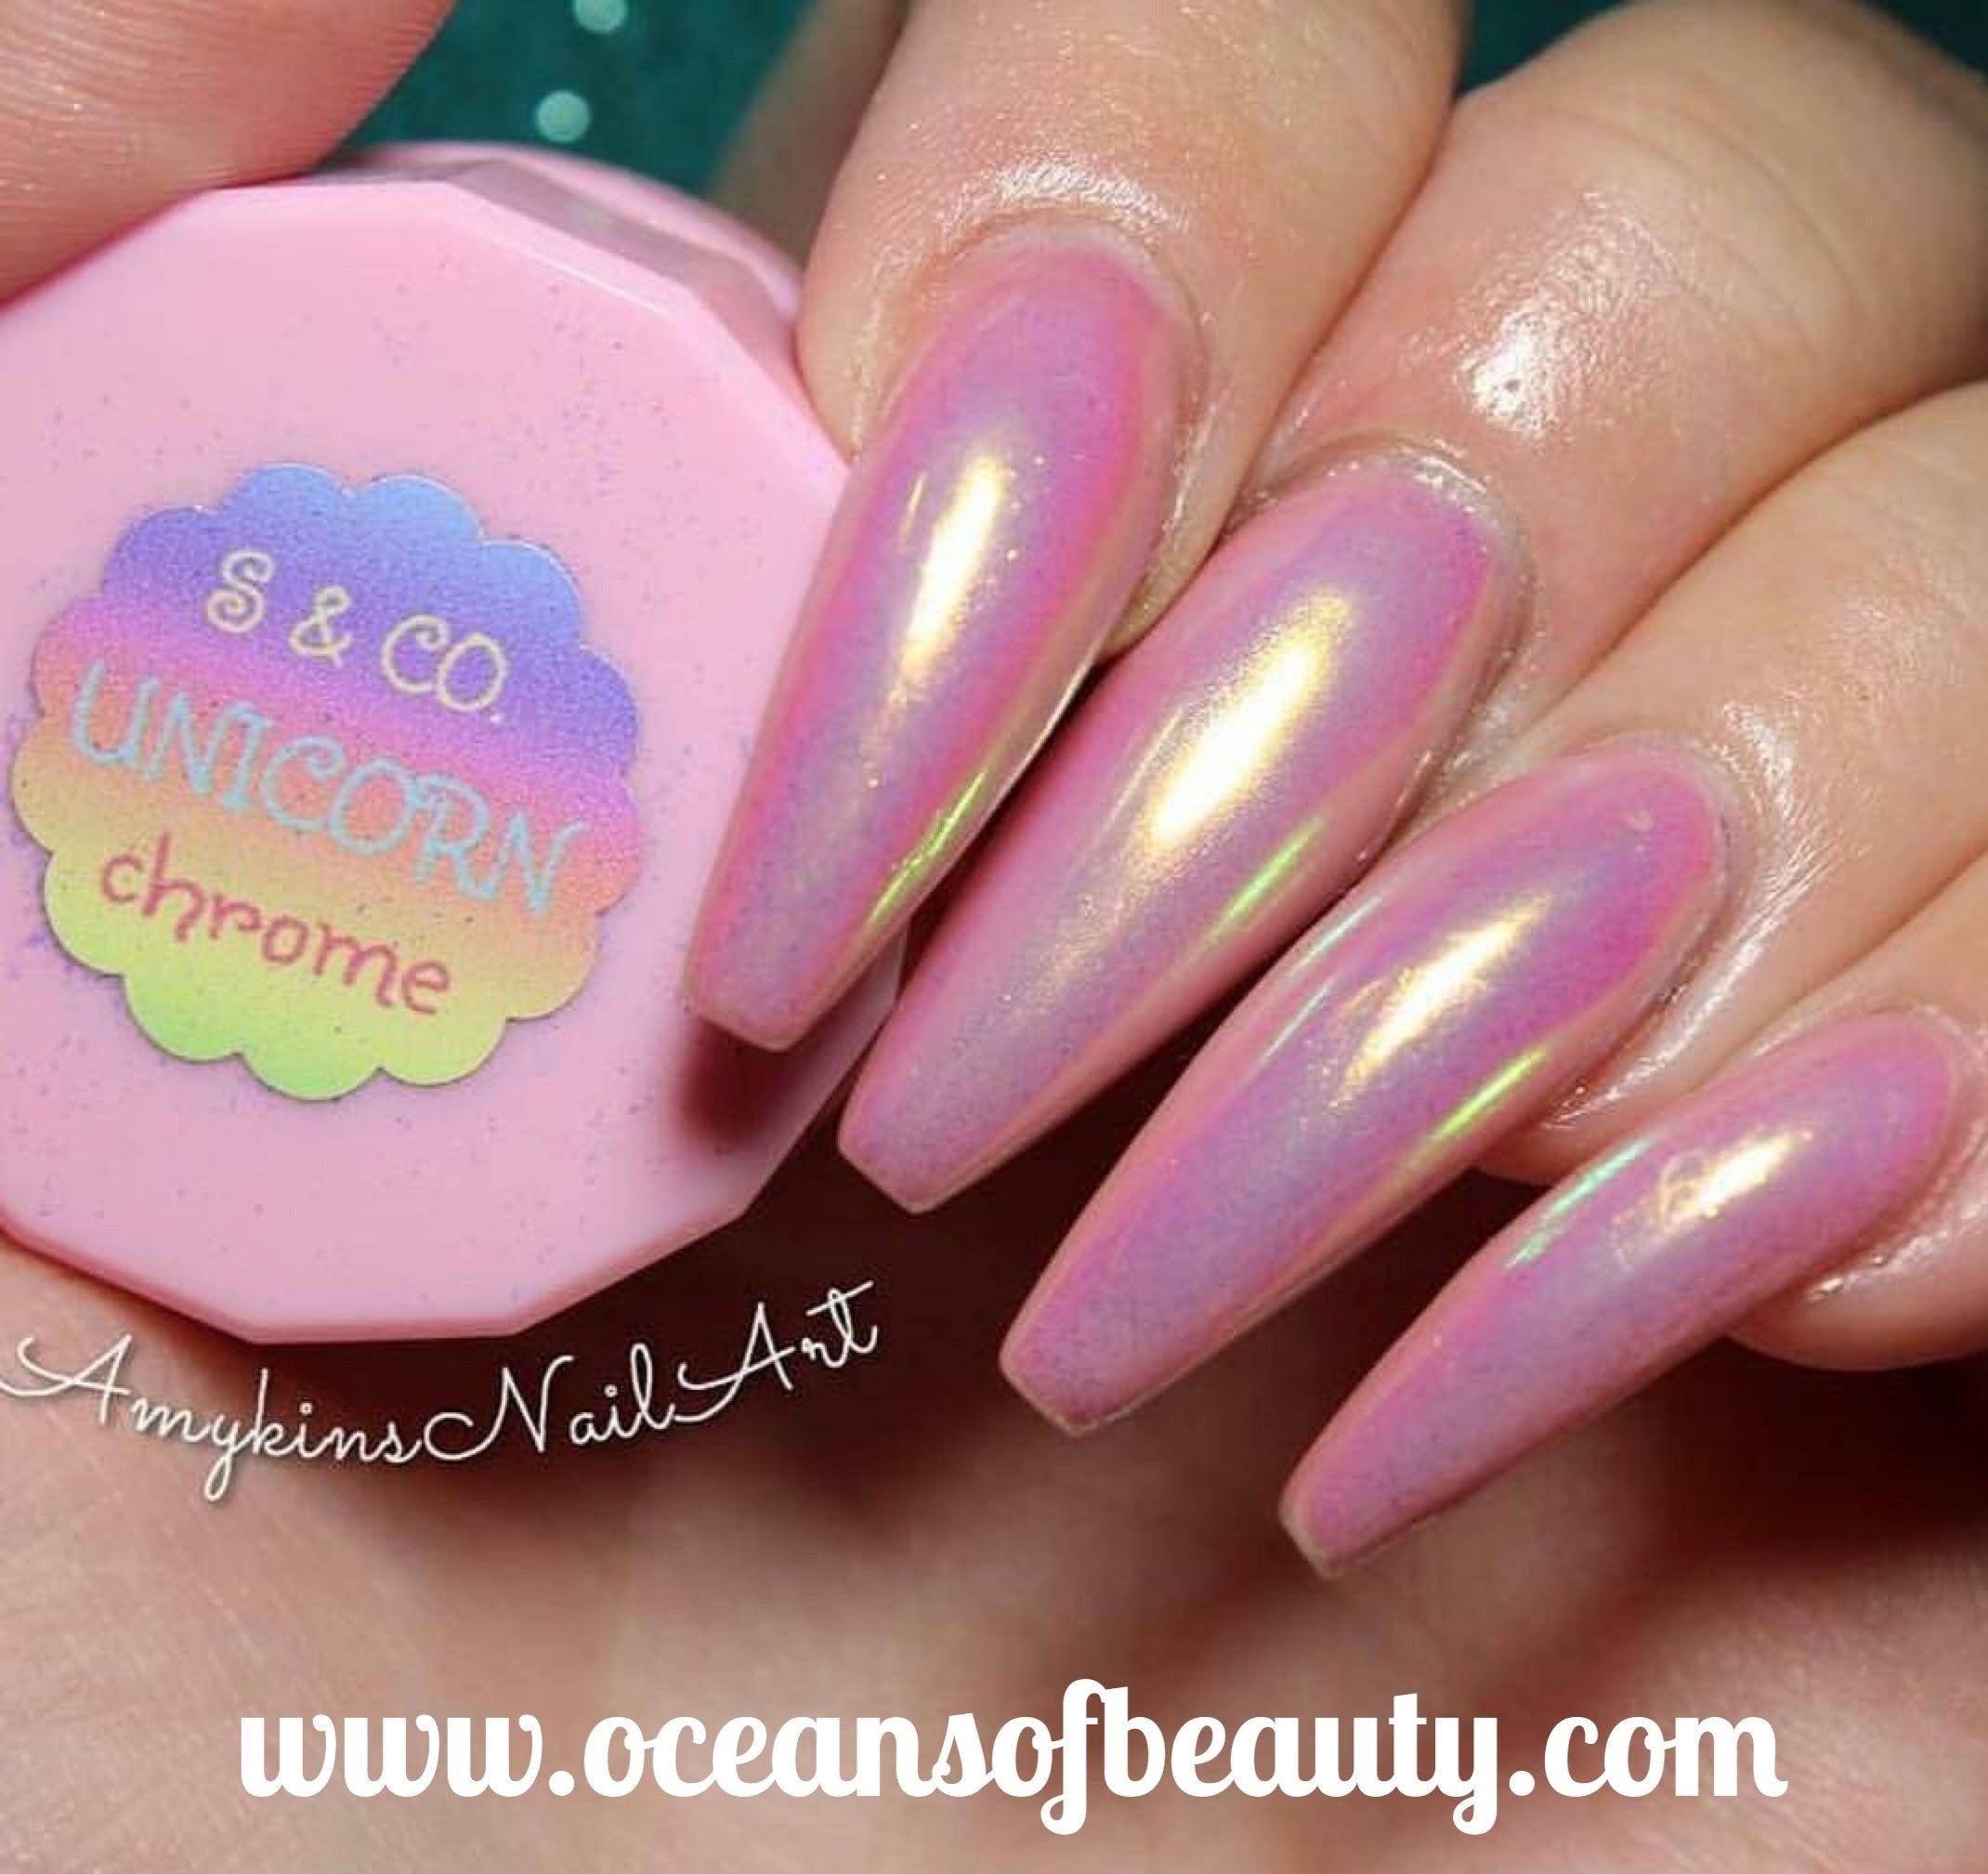 Unicorn Chrome Powder from sparkleandco.com Salon Quality done right ...